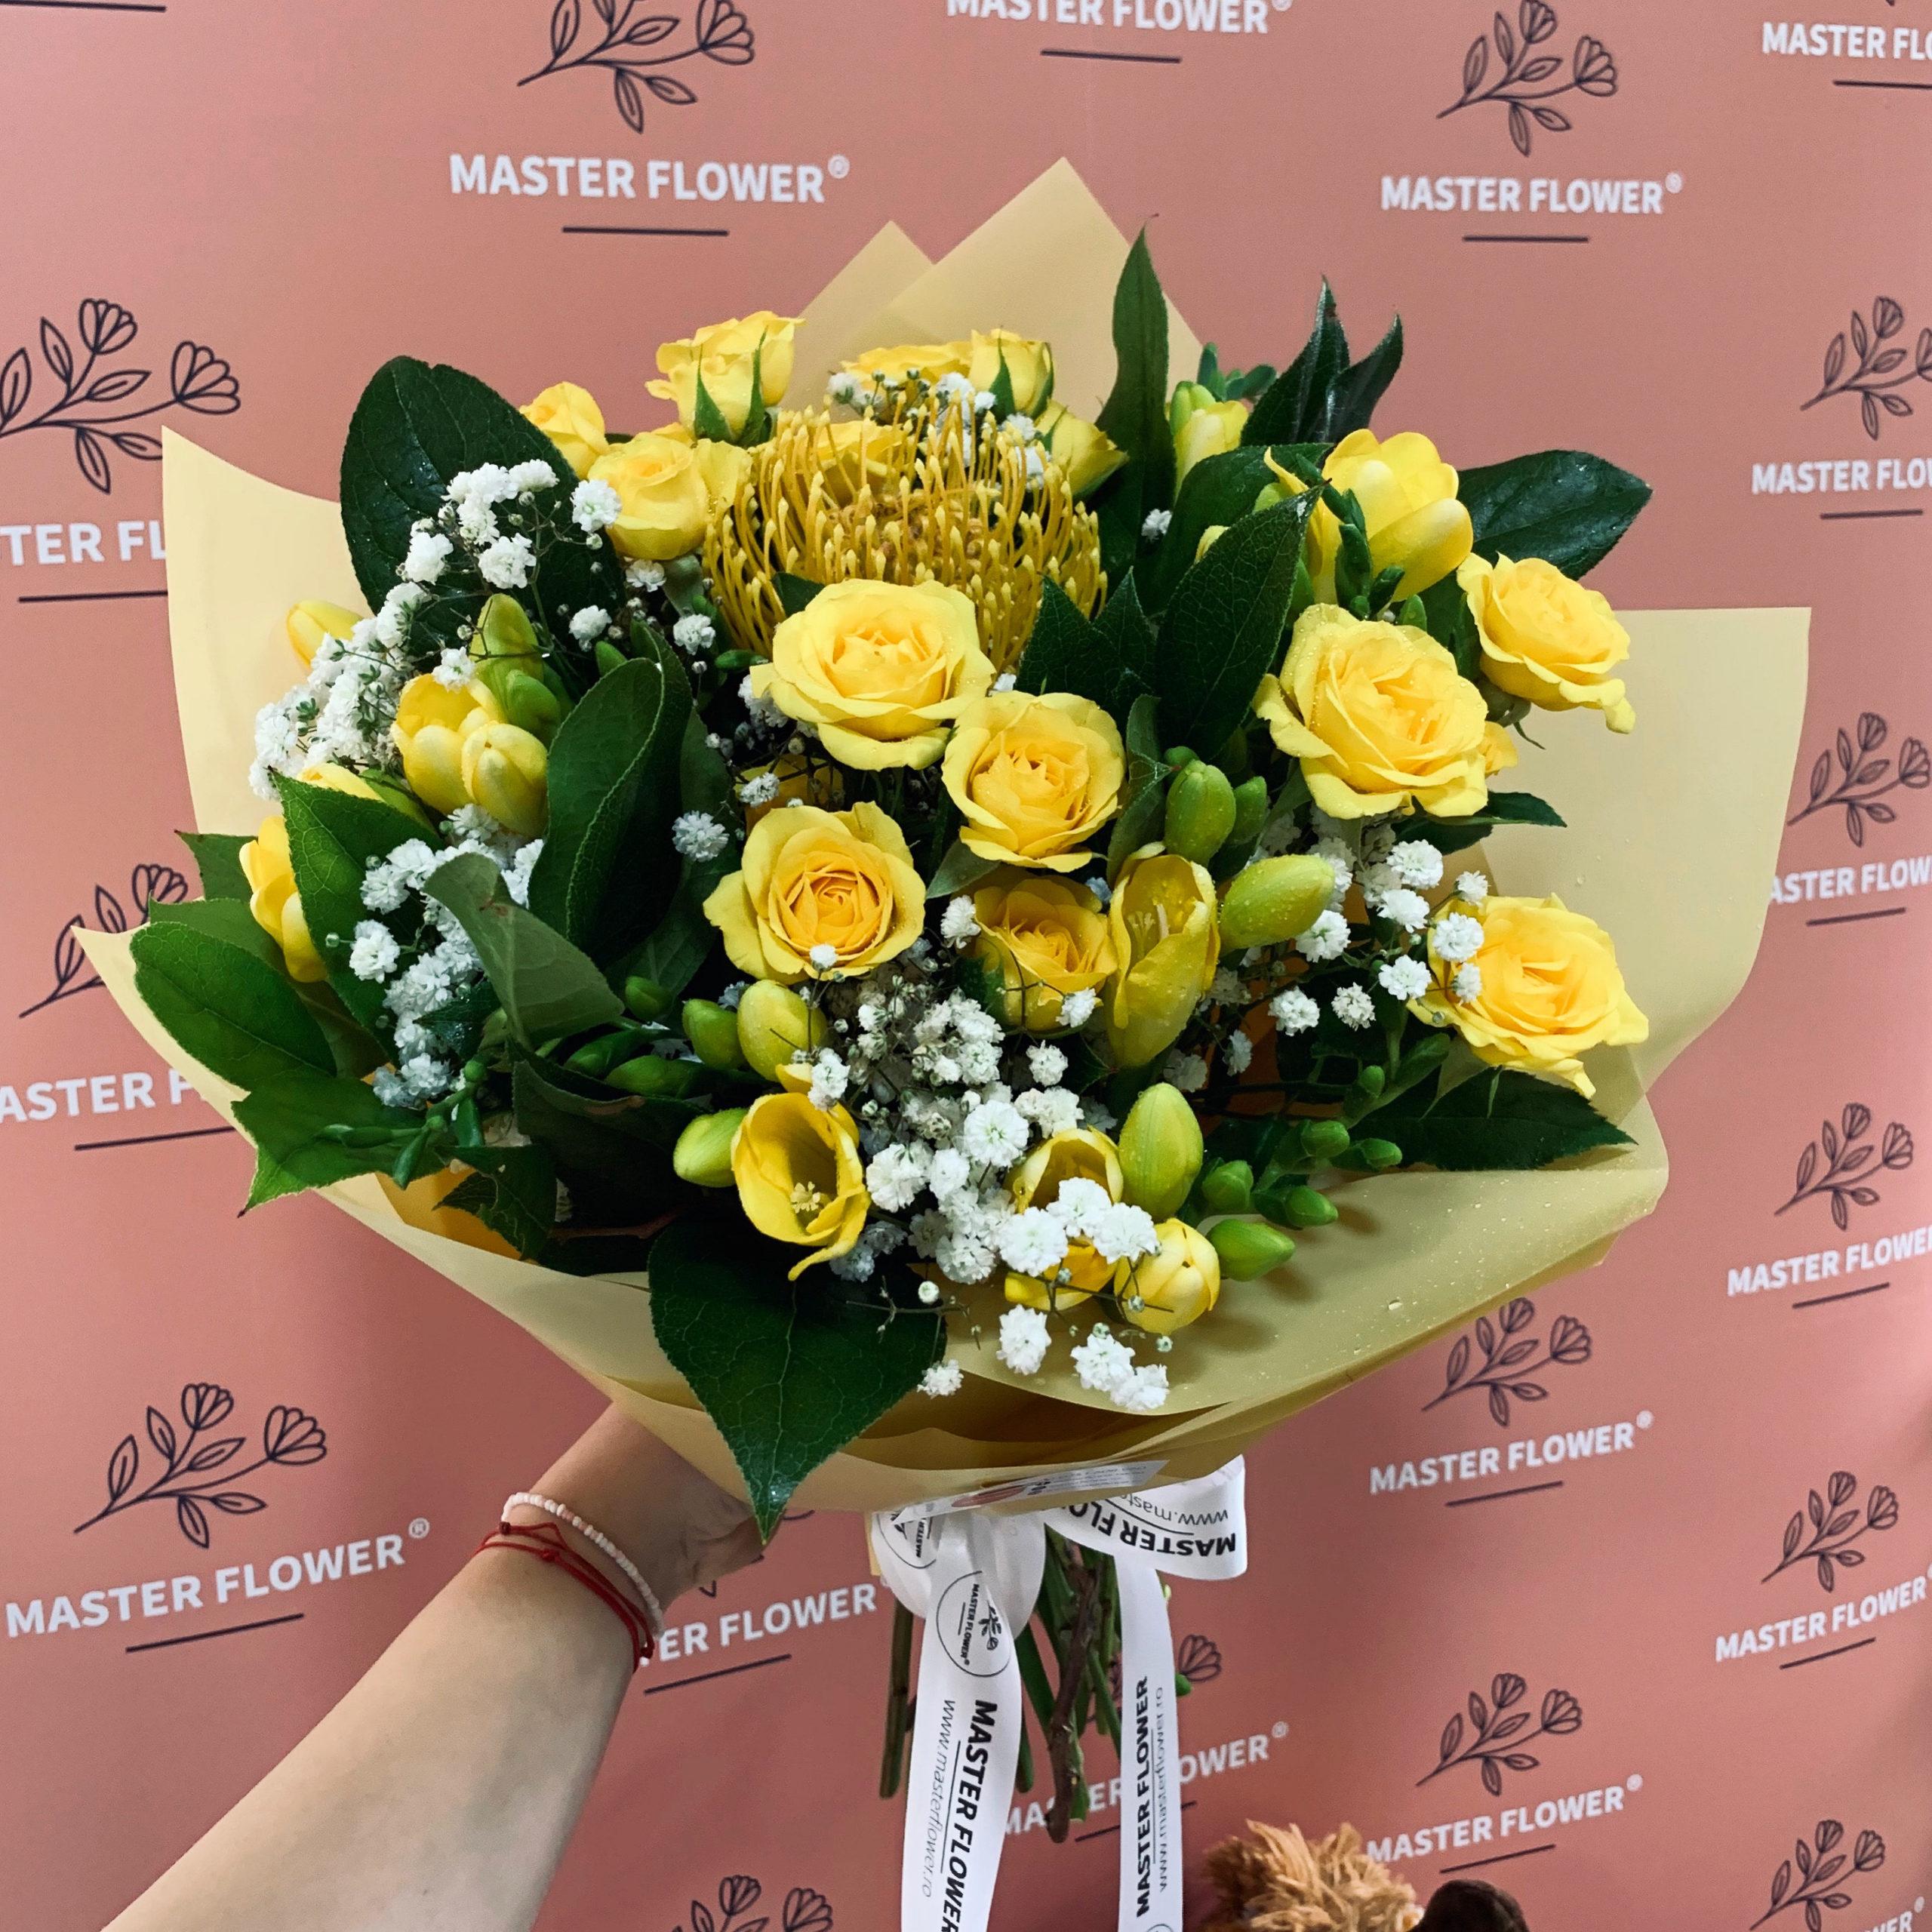 Buchet de flori cu miniroze galbene